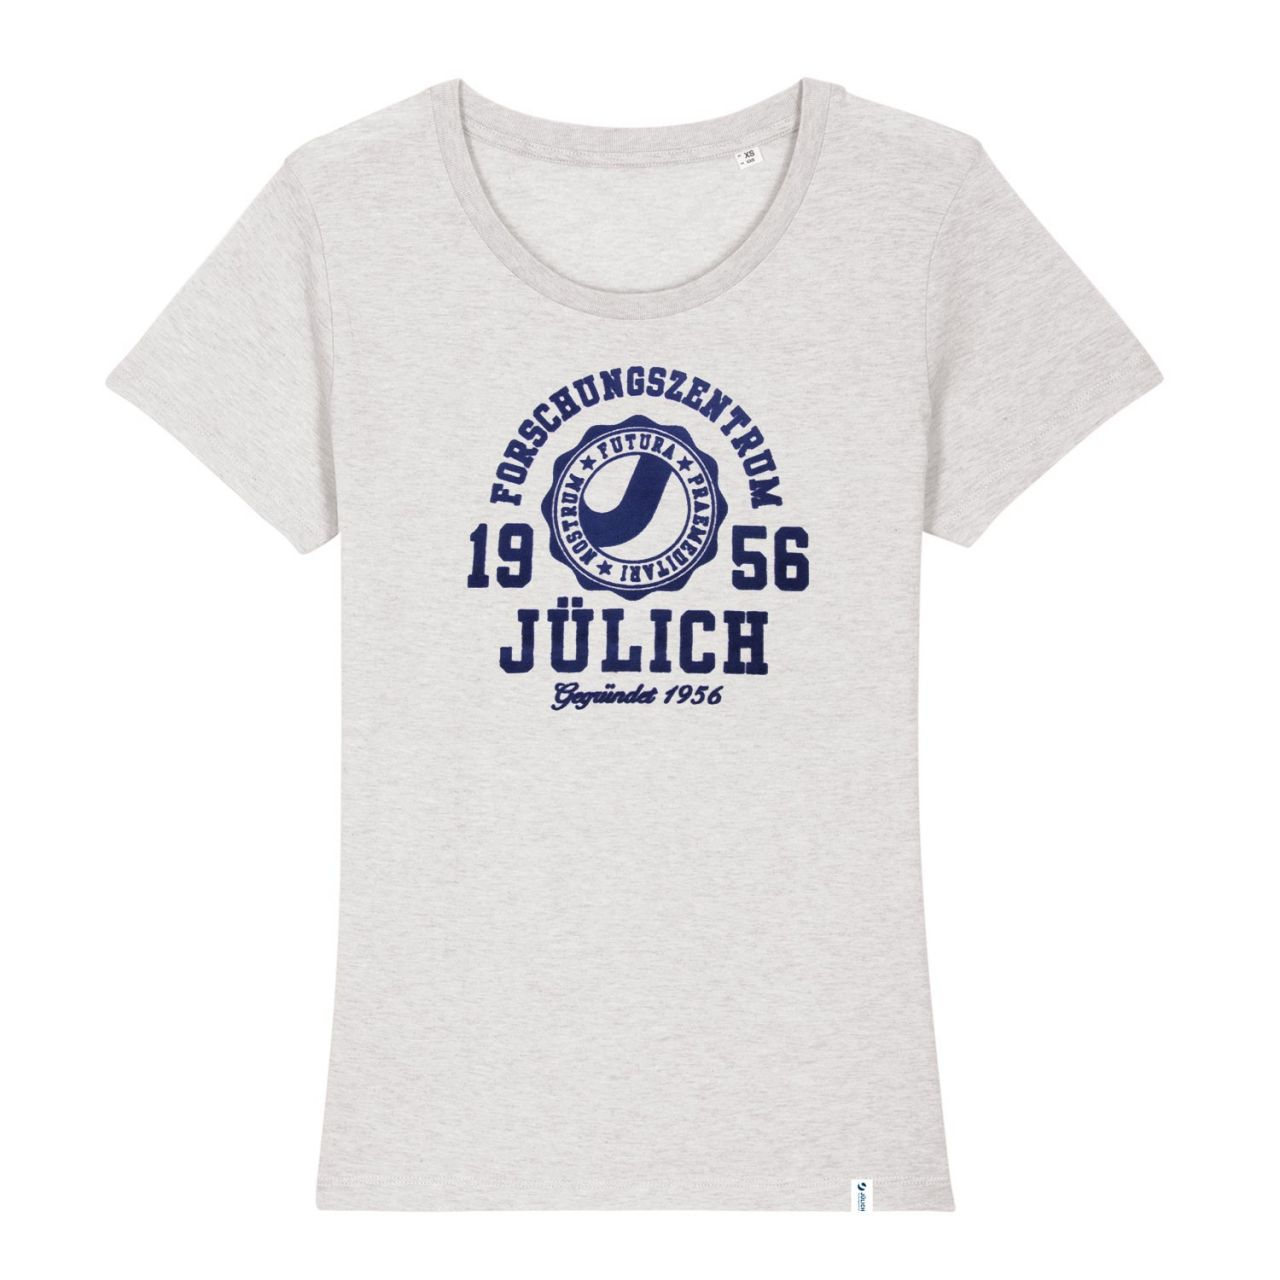 Damen Organic T-Shirt, cream heather grey, marshall.flock.navy